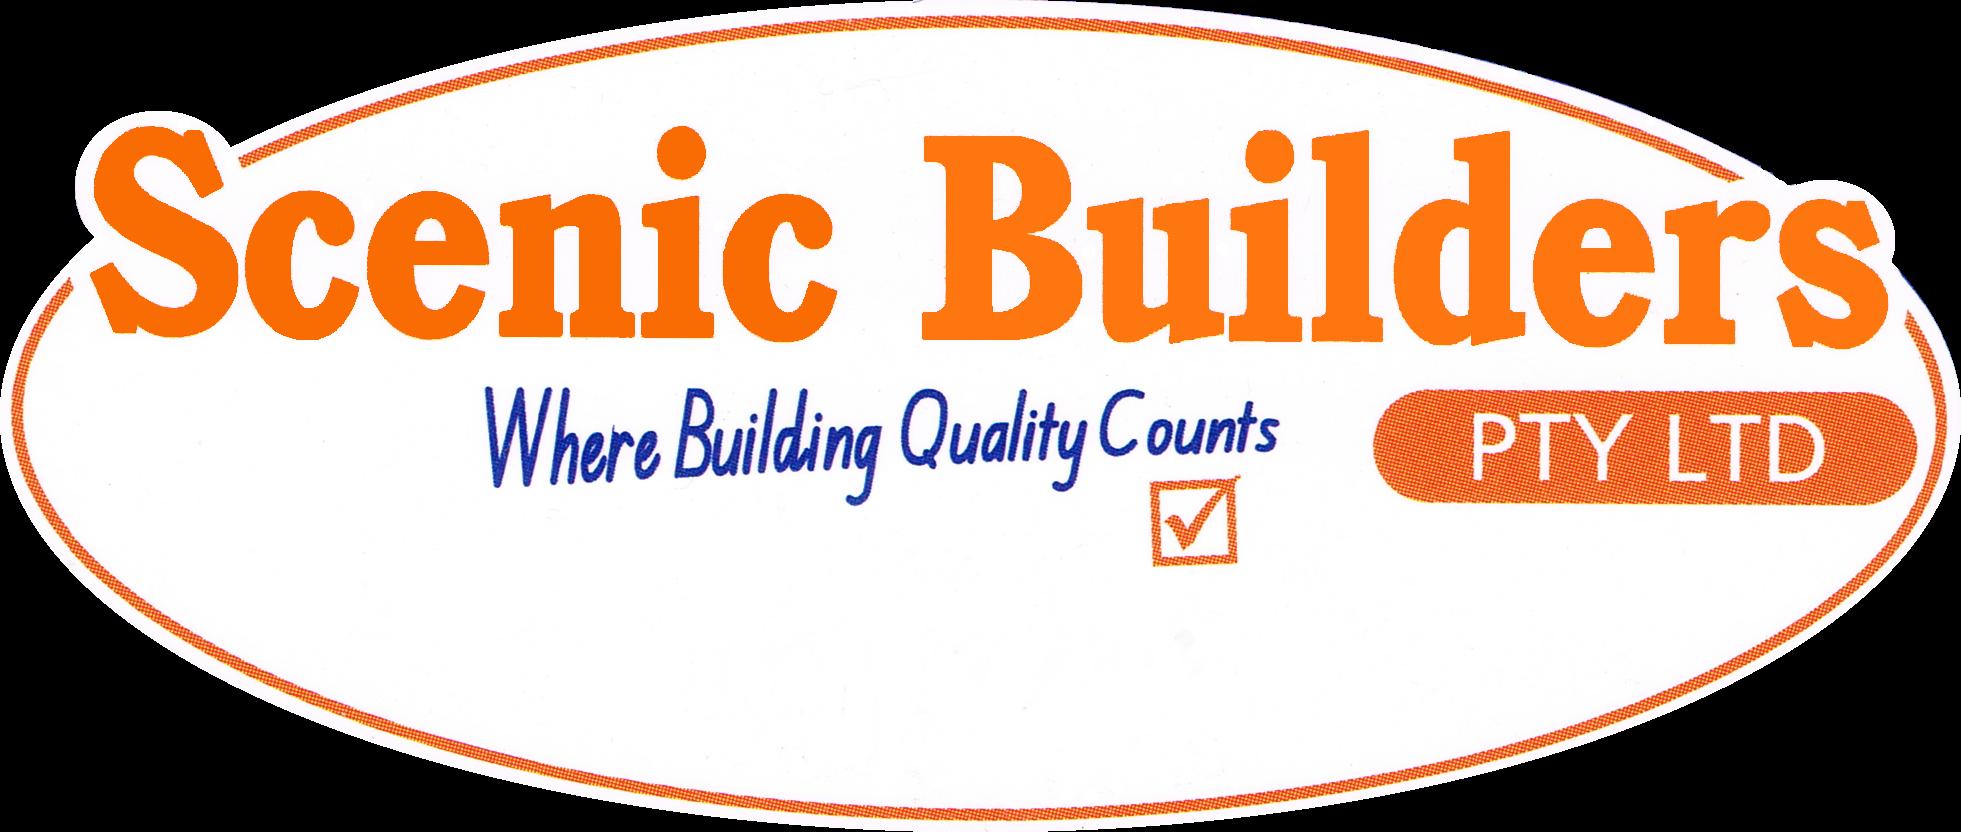 Scenic Builders